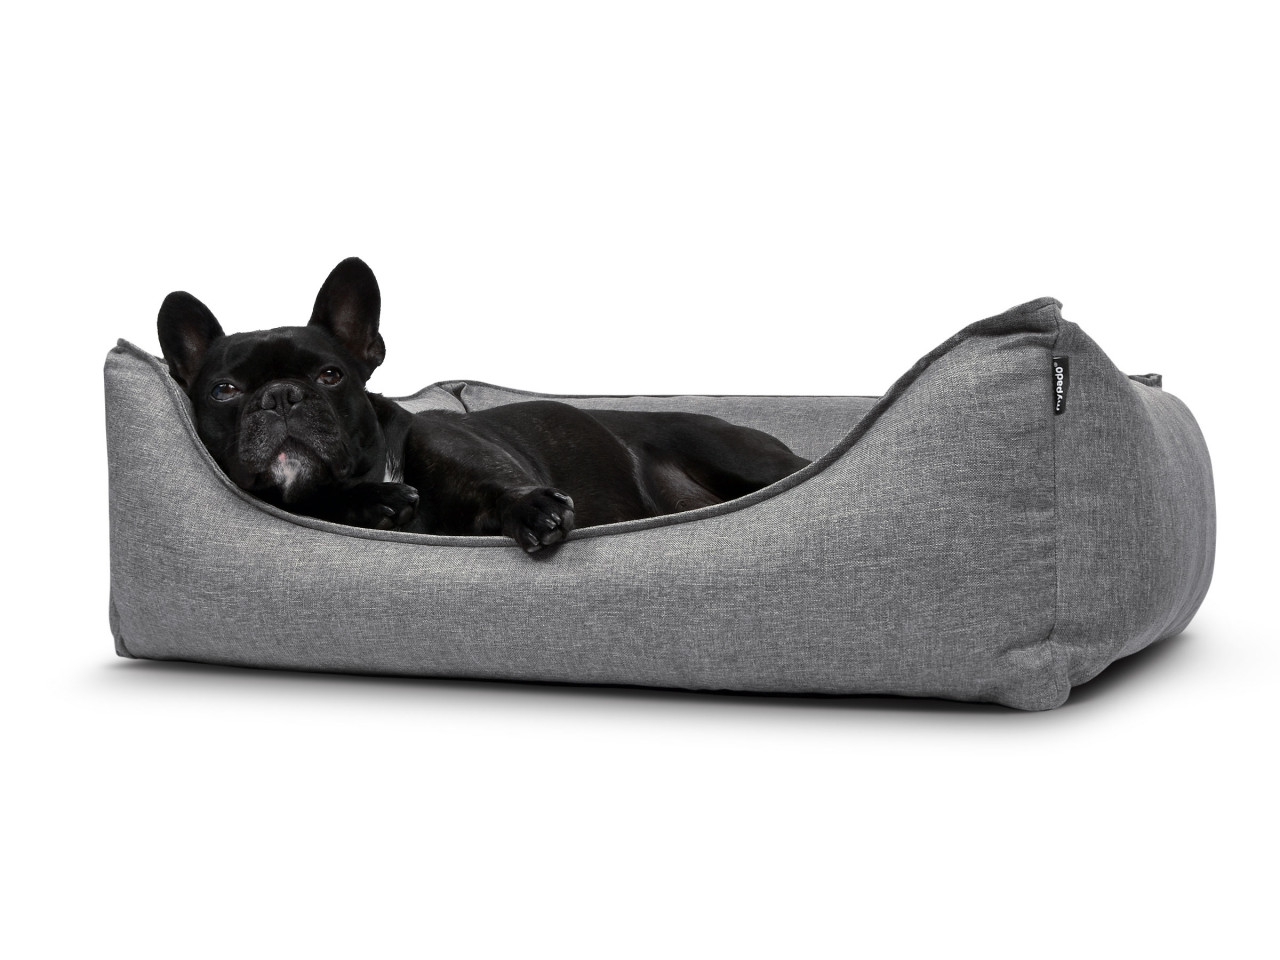 hundebett-dream-grey-hund